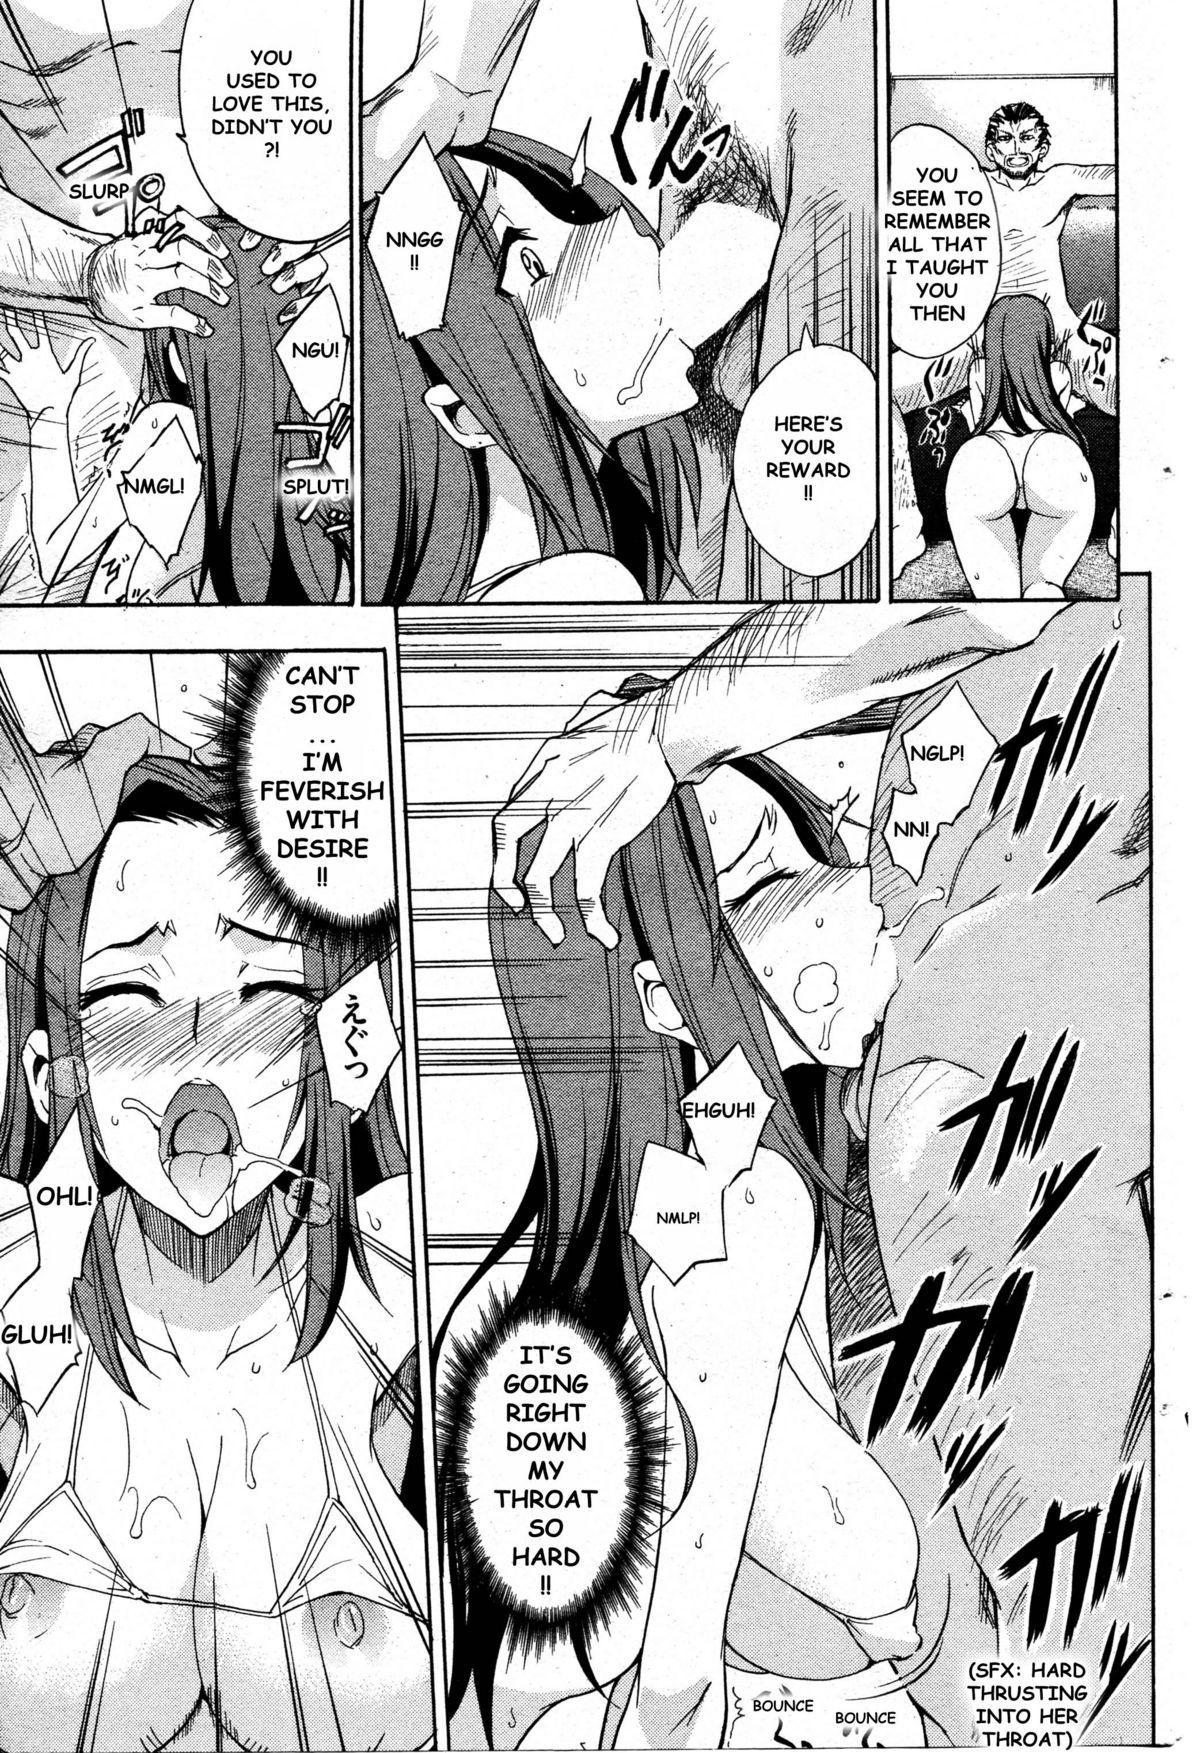 Okusan no Himitsu | A Wife's Secret 8